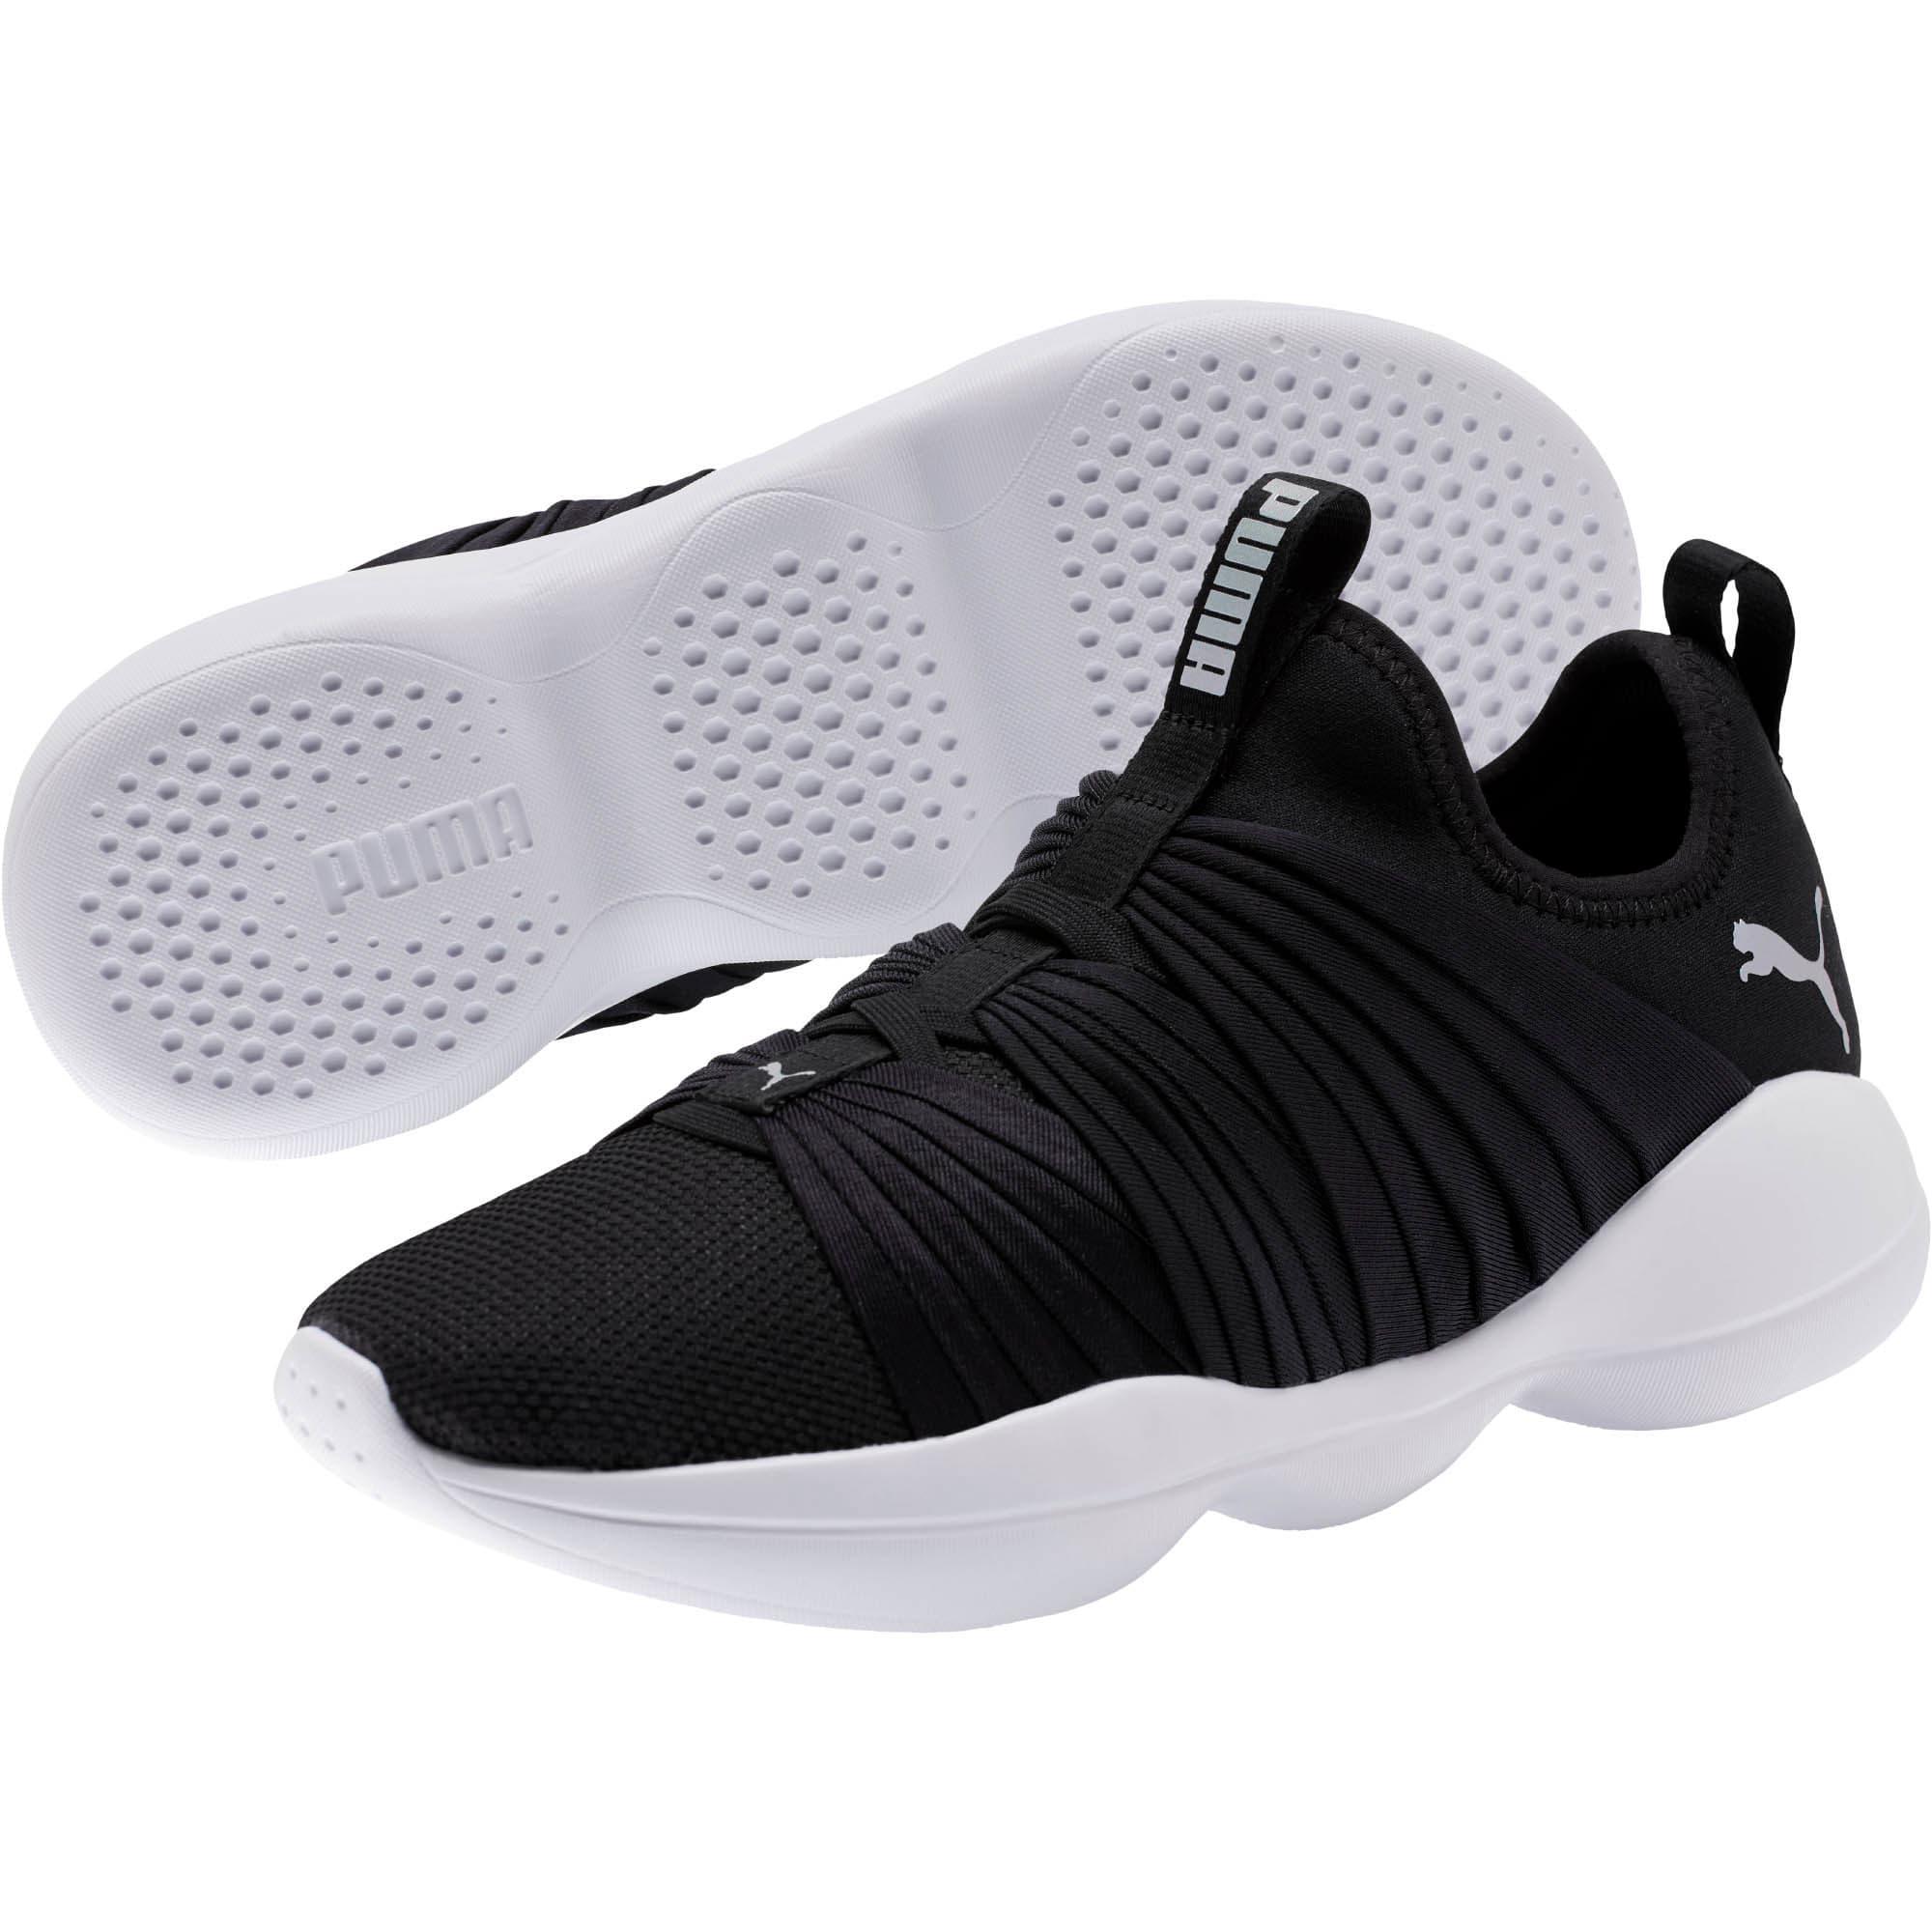 Thumbnail 2 of Flourish Stellar Women's Training Shoes, Puma Black-Puma White, medium